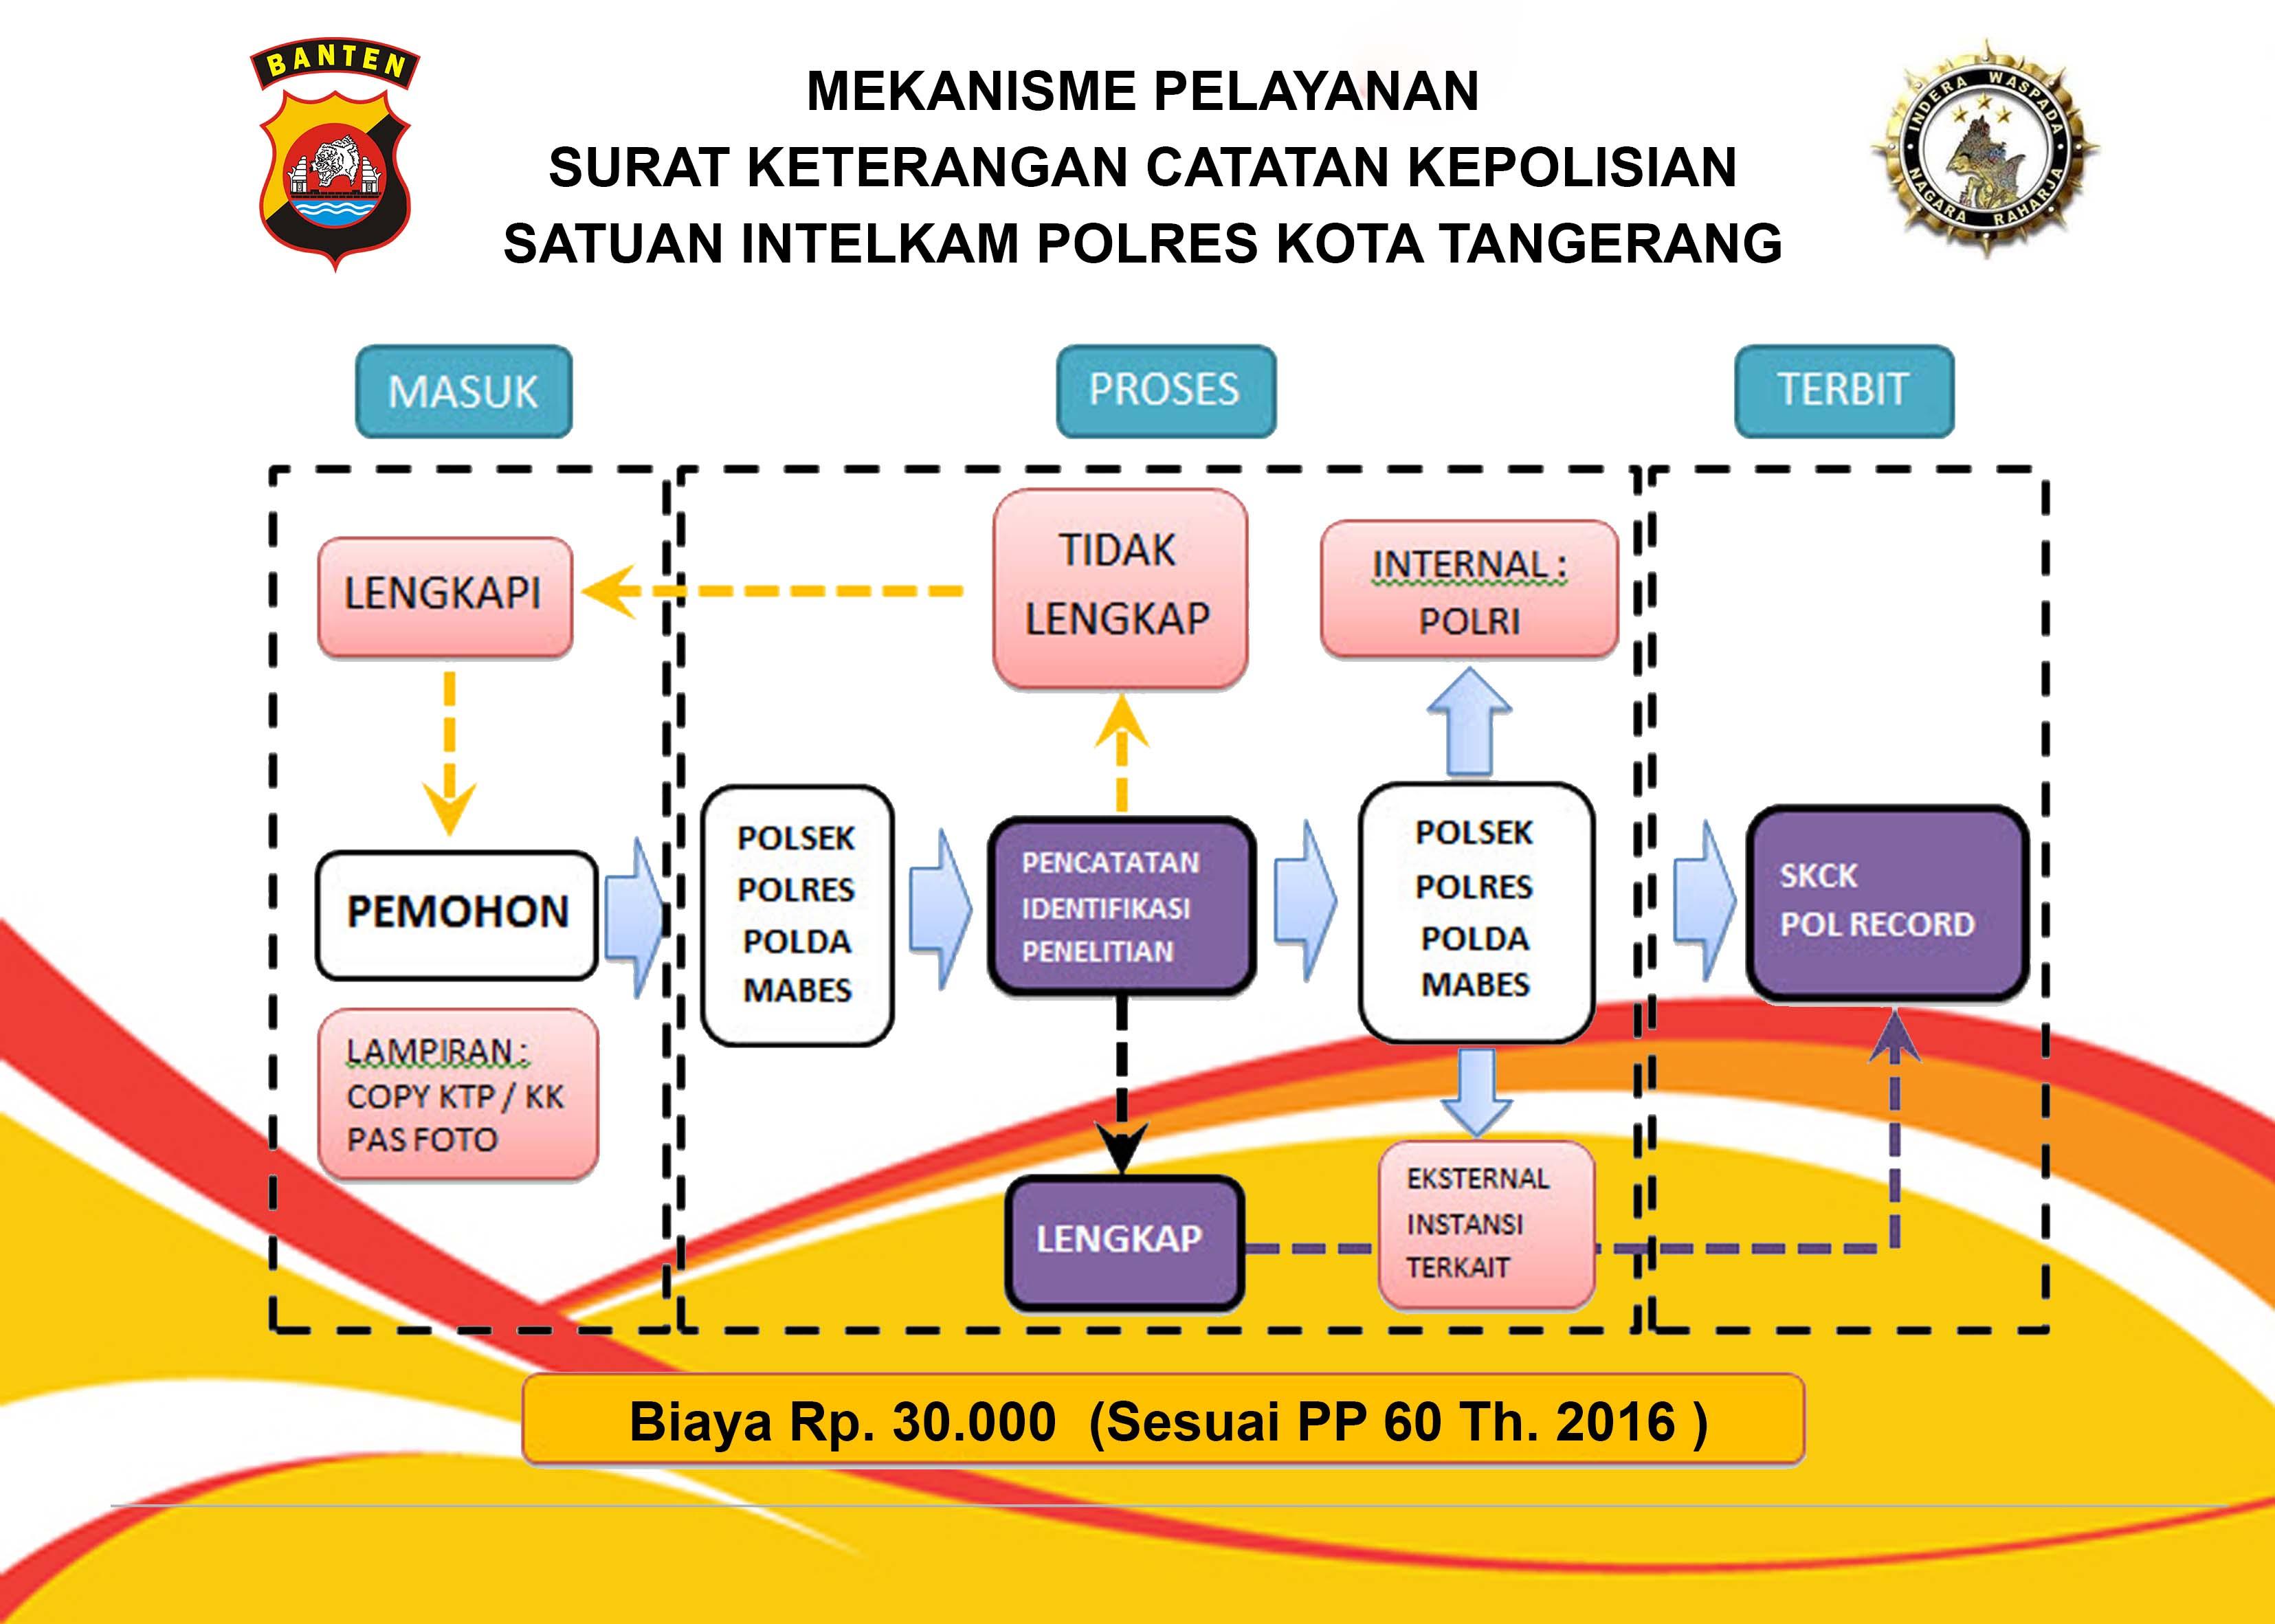 Mekanisme Pelayanan Surat Keterangan Catatan Kepolisian